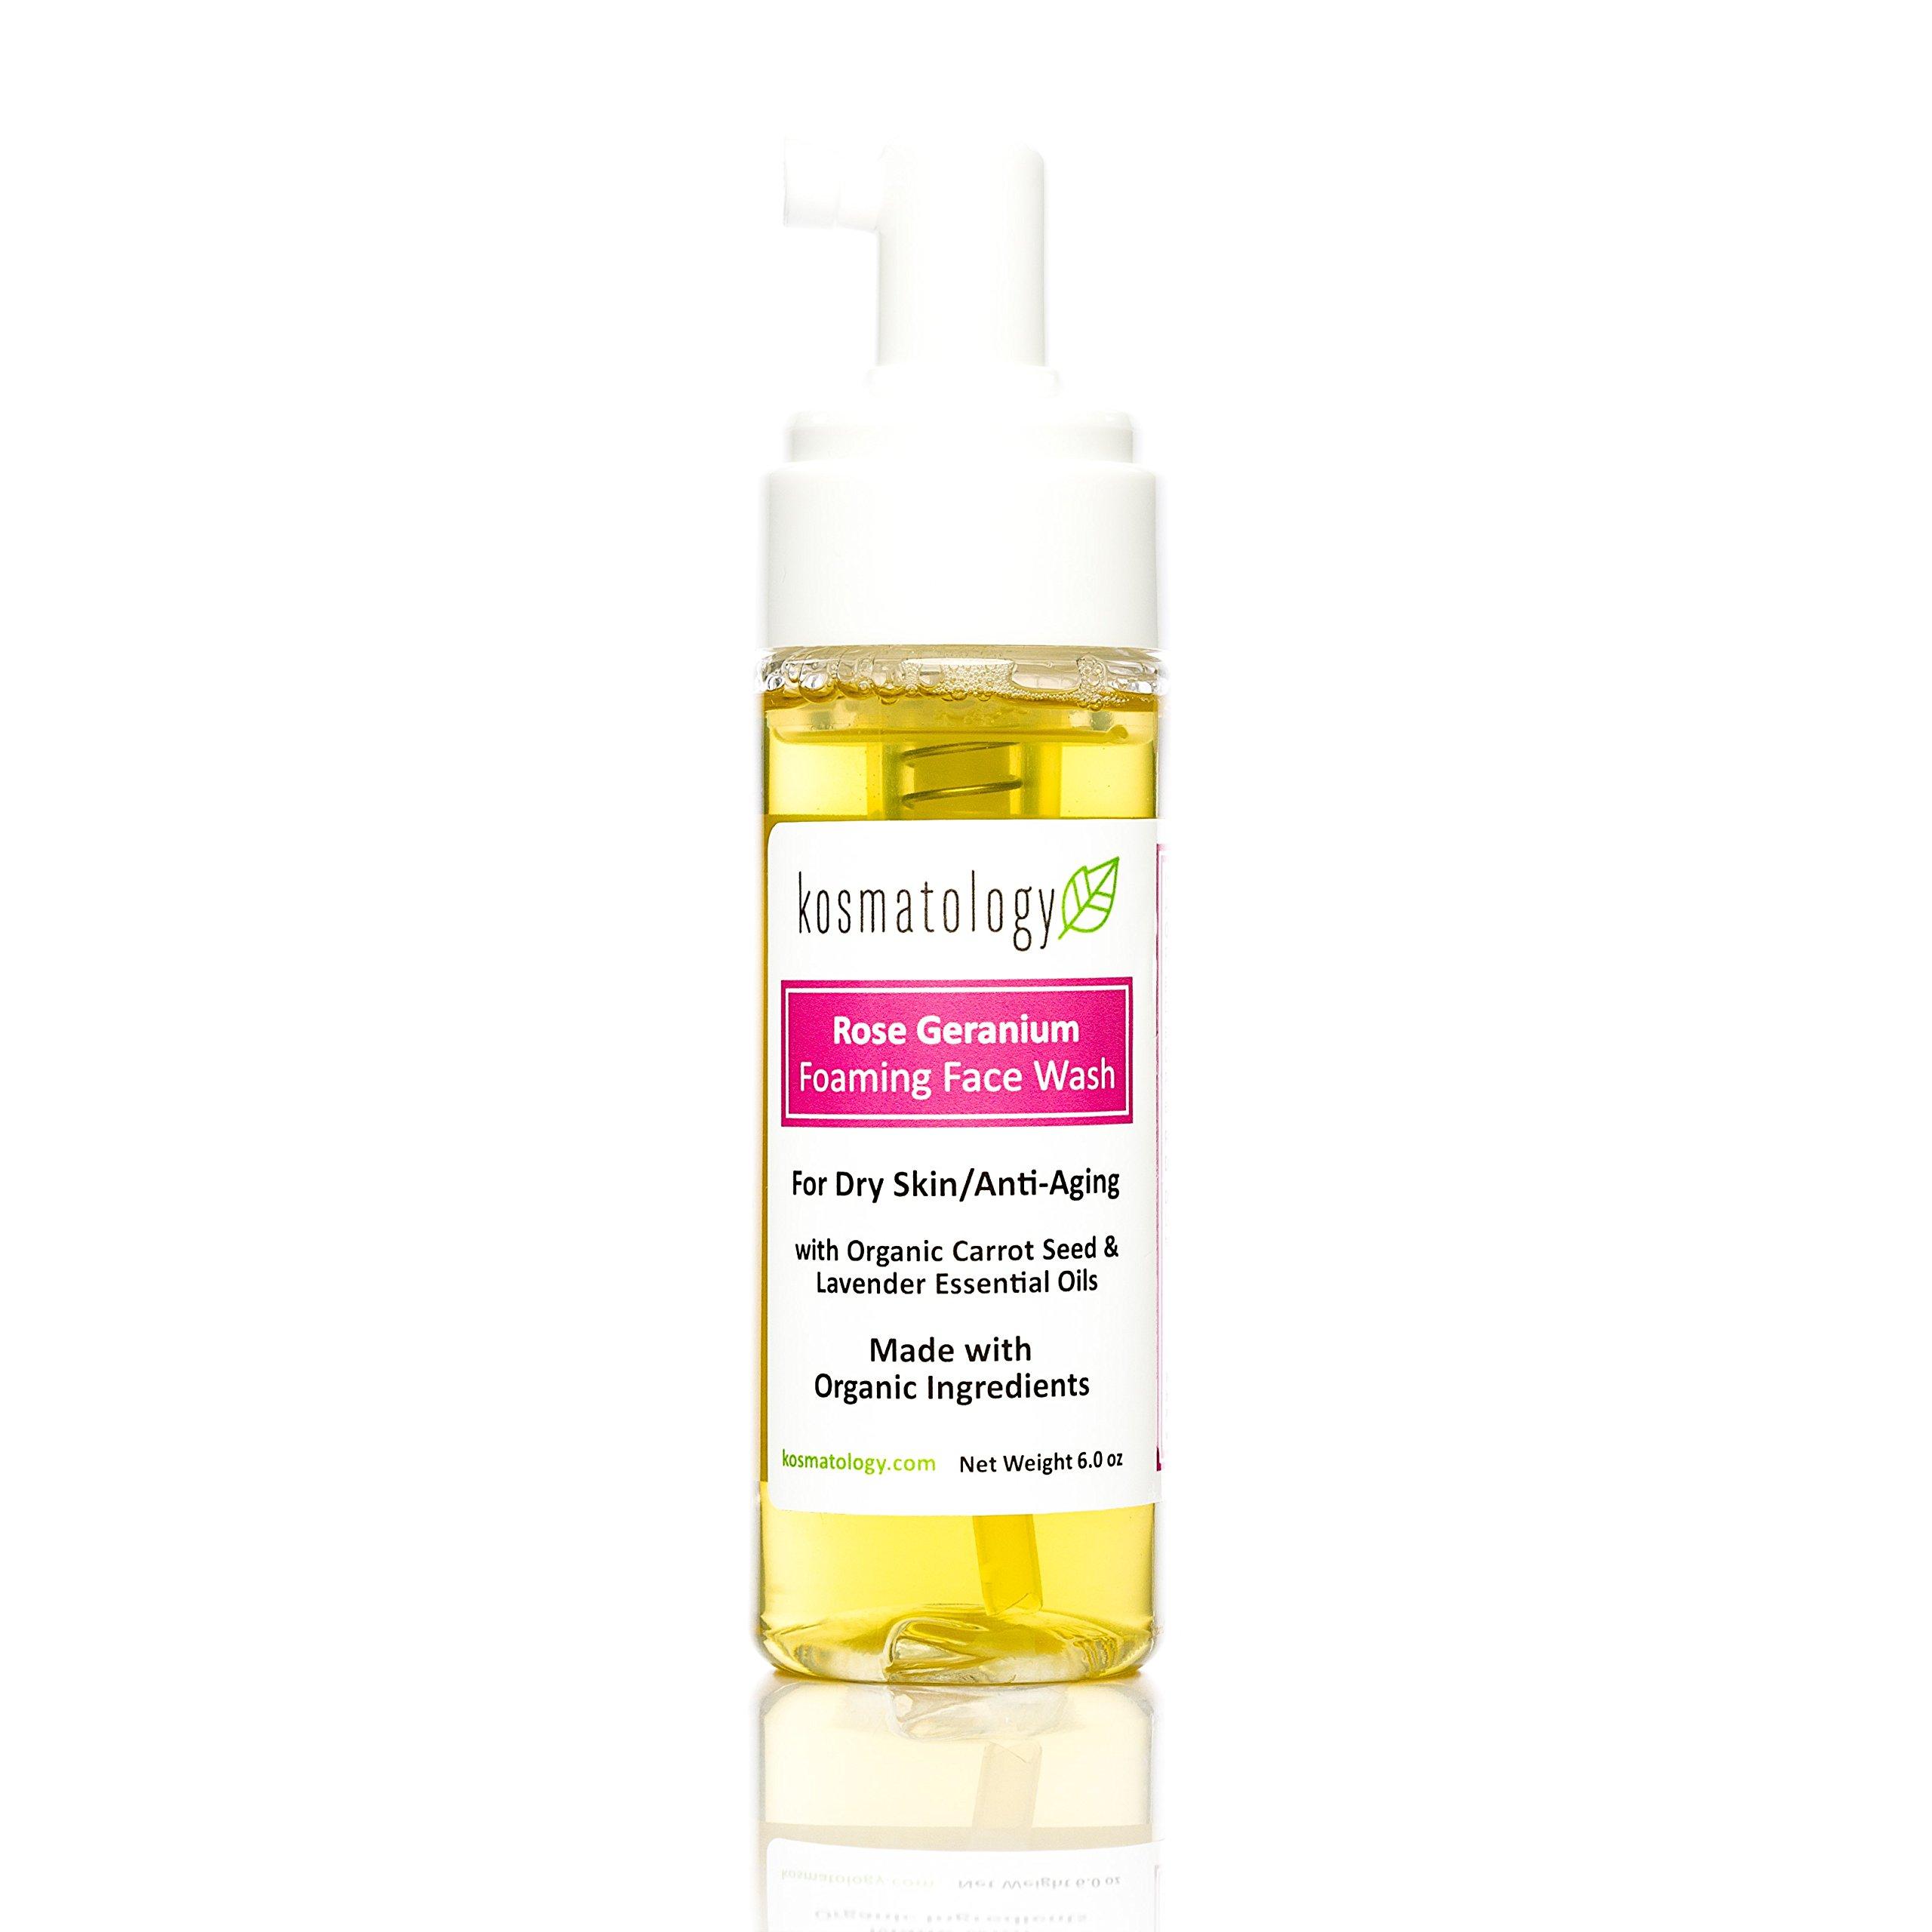 Foaming Face Wash Lemongrass - 6 fl. oz. by Kosmatology (pack of 1) Vincent Longo Baby Balm Sheer Contessa .12 Oz.